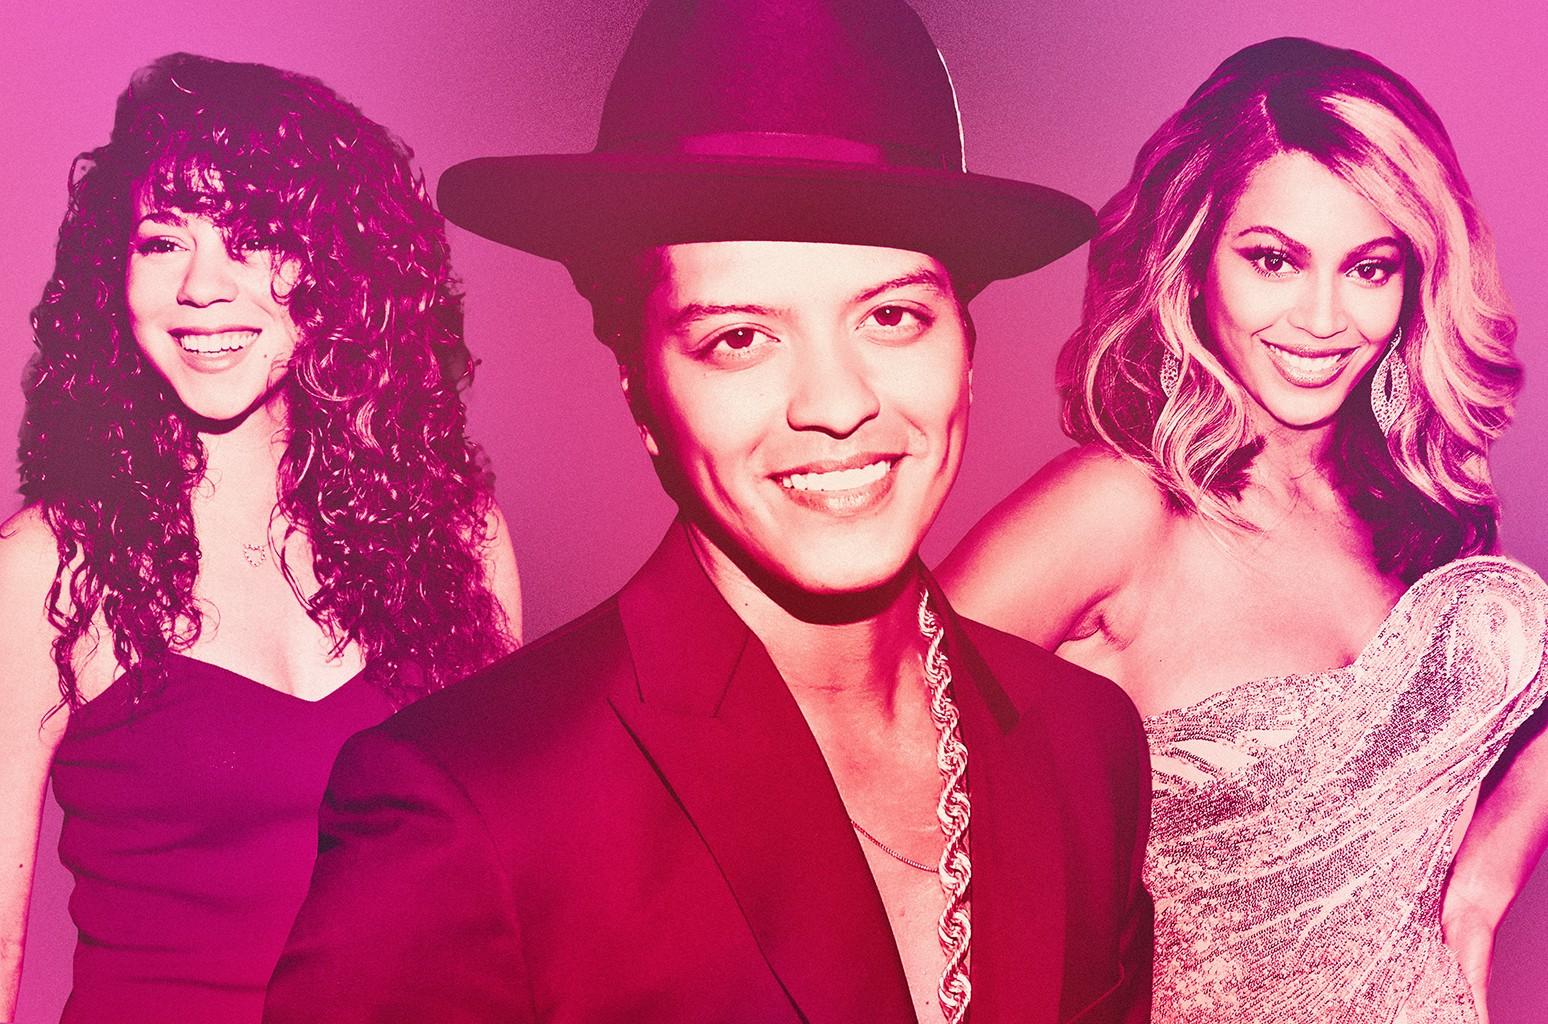 From left: Mariah Carey, Bruno Mars & Beyoncé